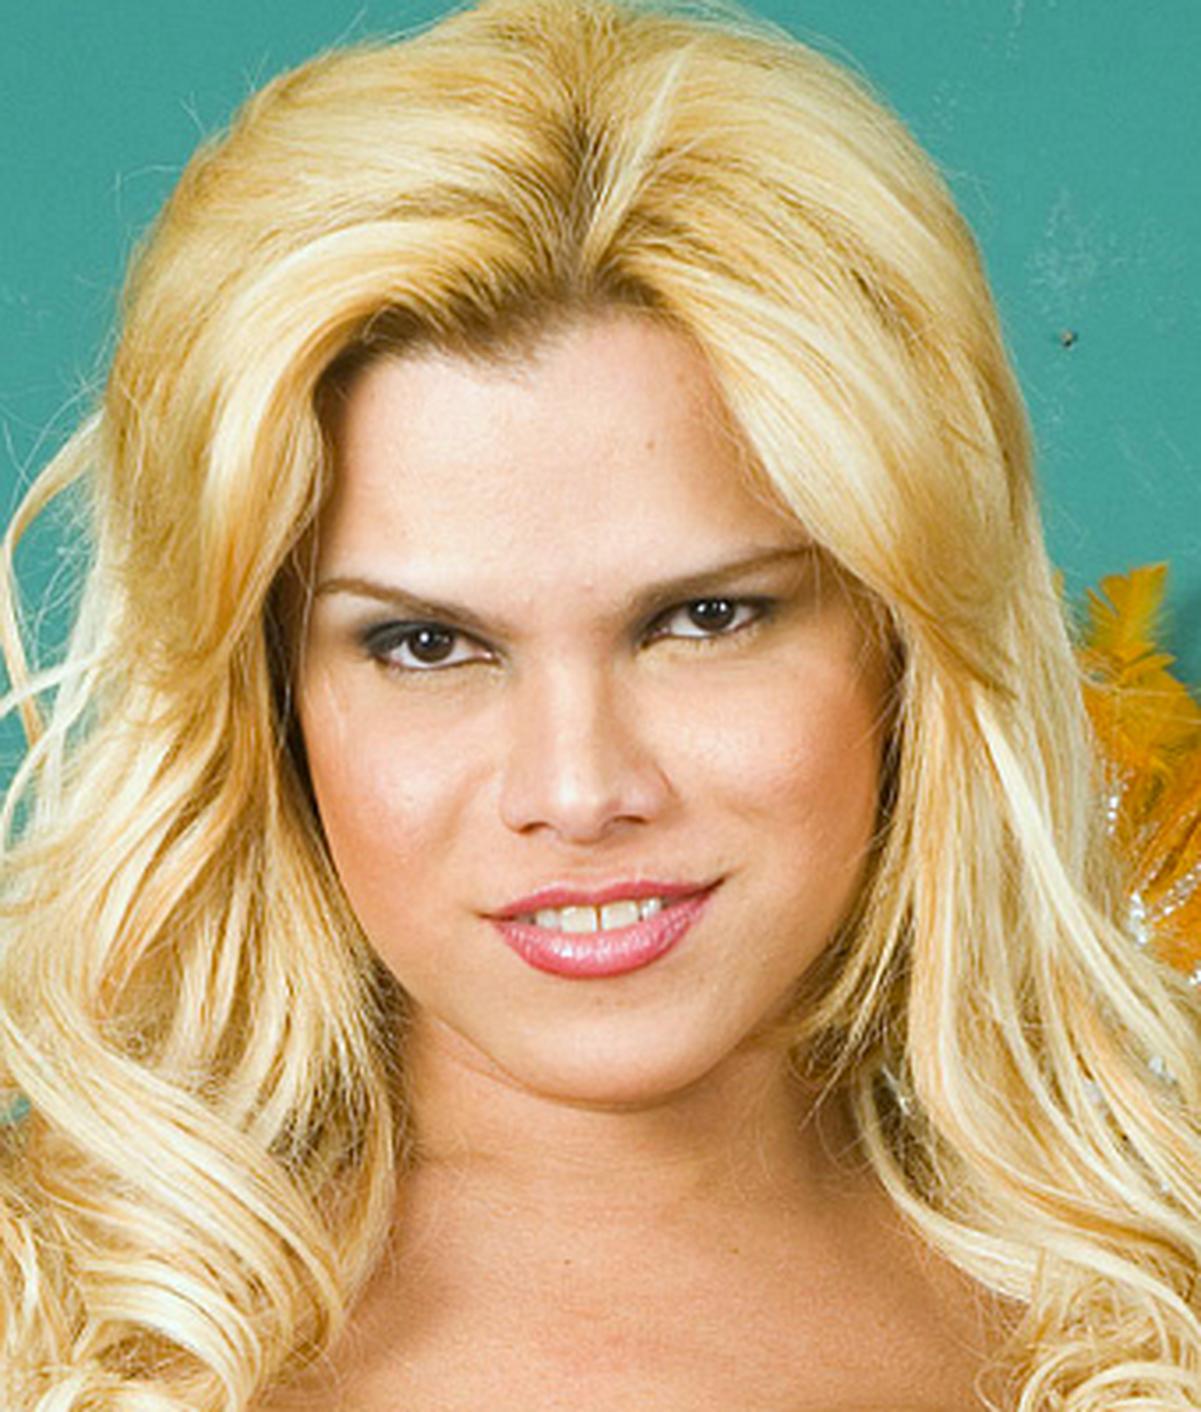 Hilda Brasil wiki, Hilda Brasil bio, Hilda Brasil news